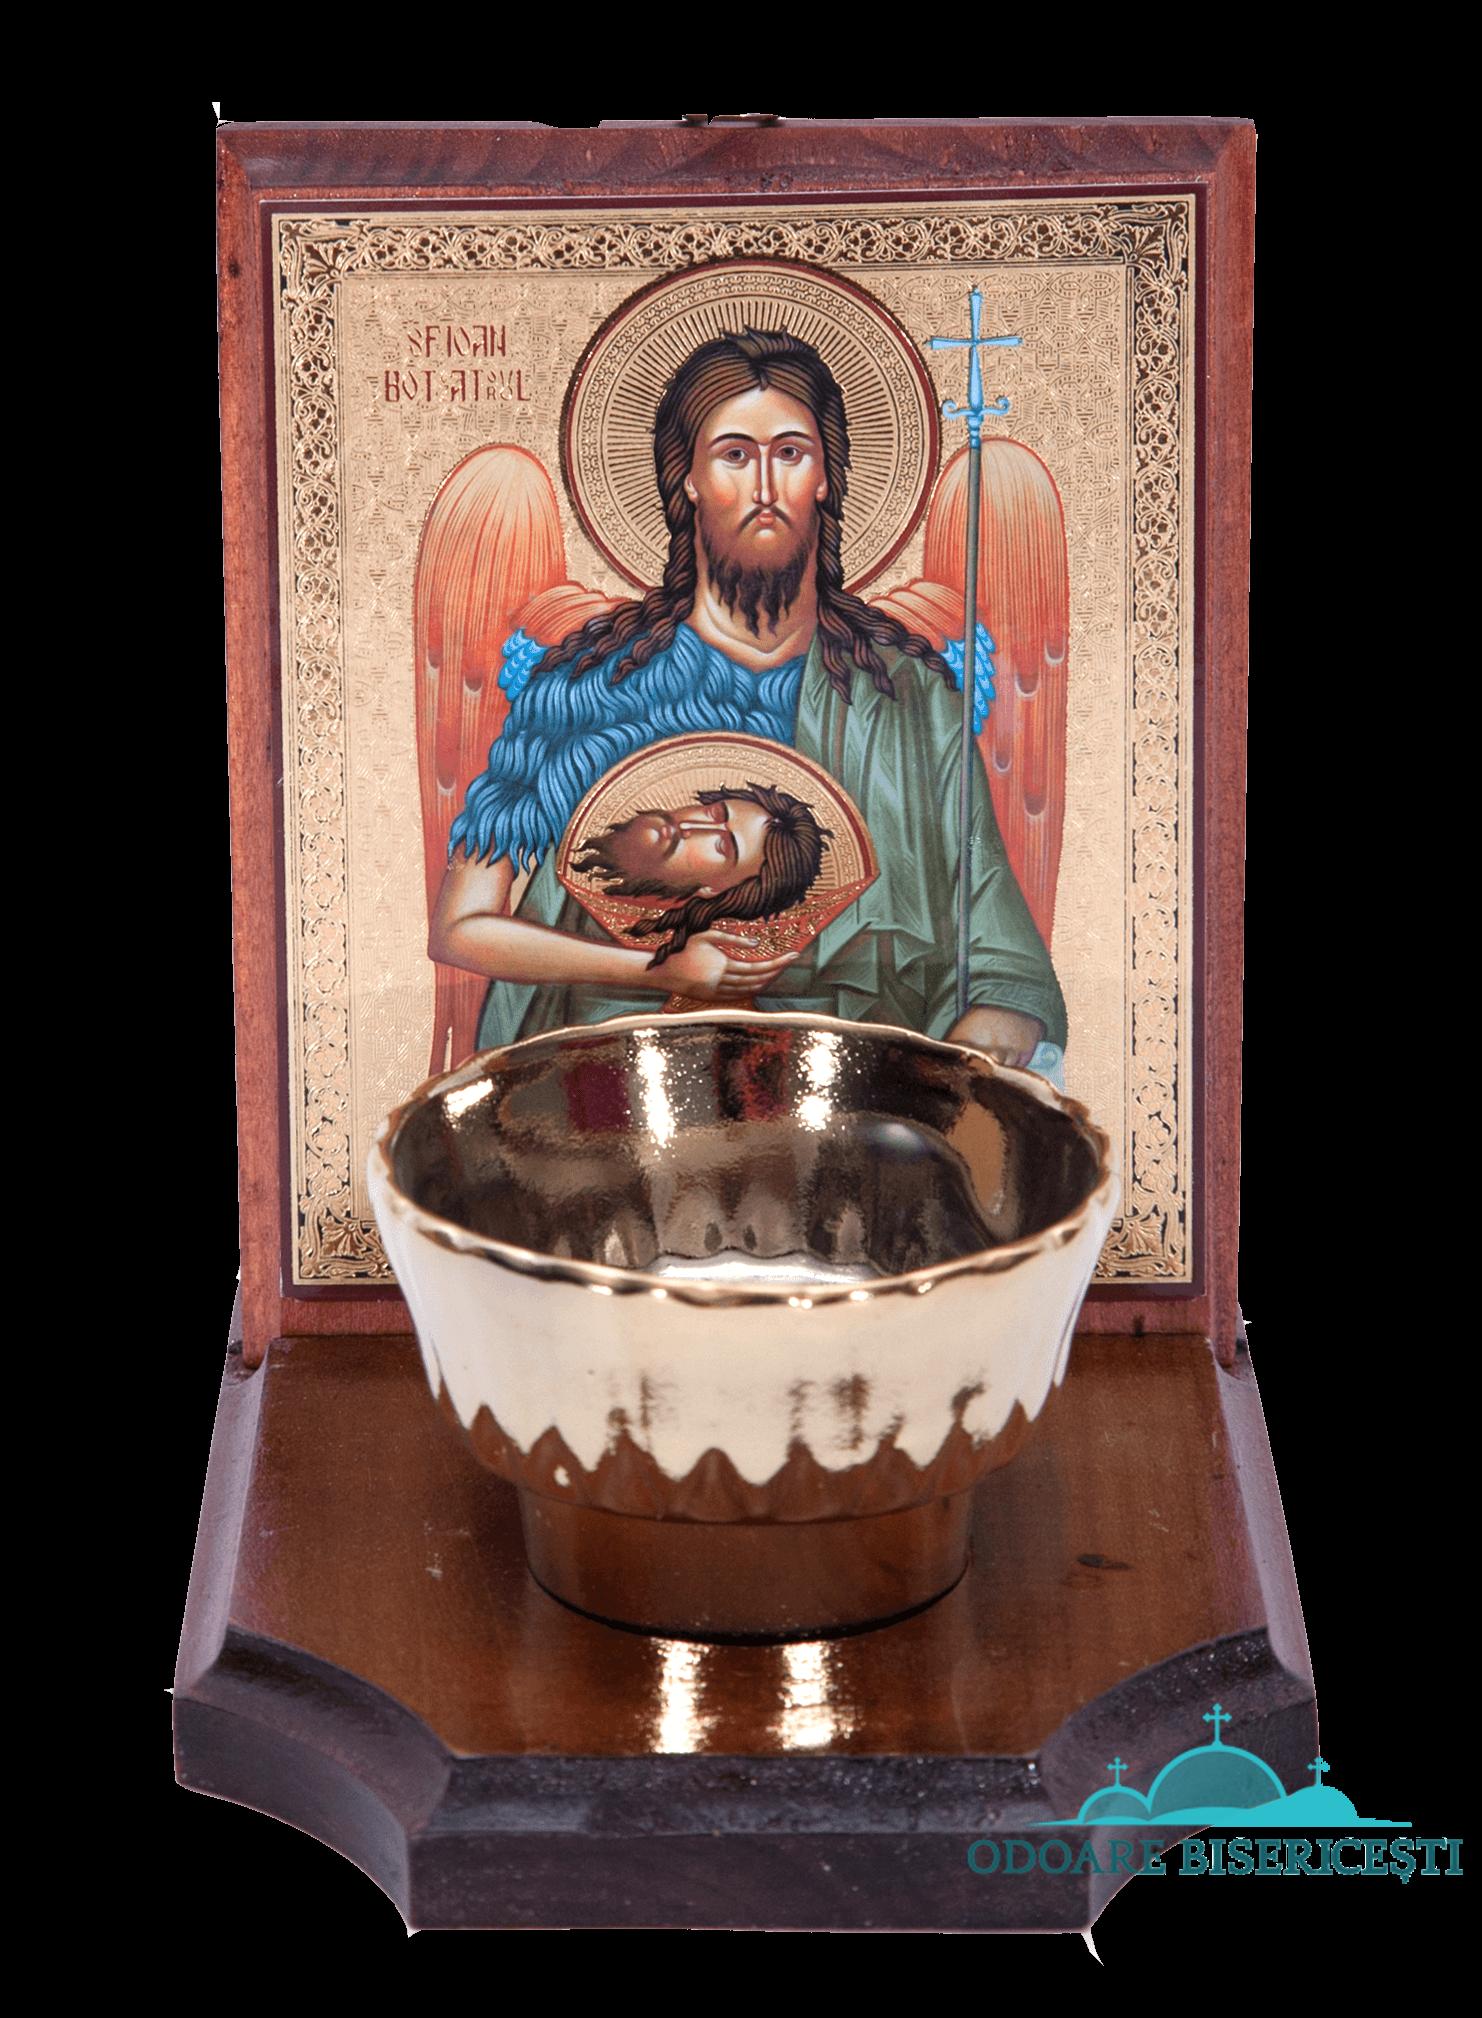 Icoana Candela Sf. Ioan Botezatorul